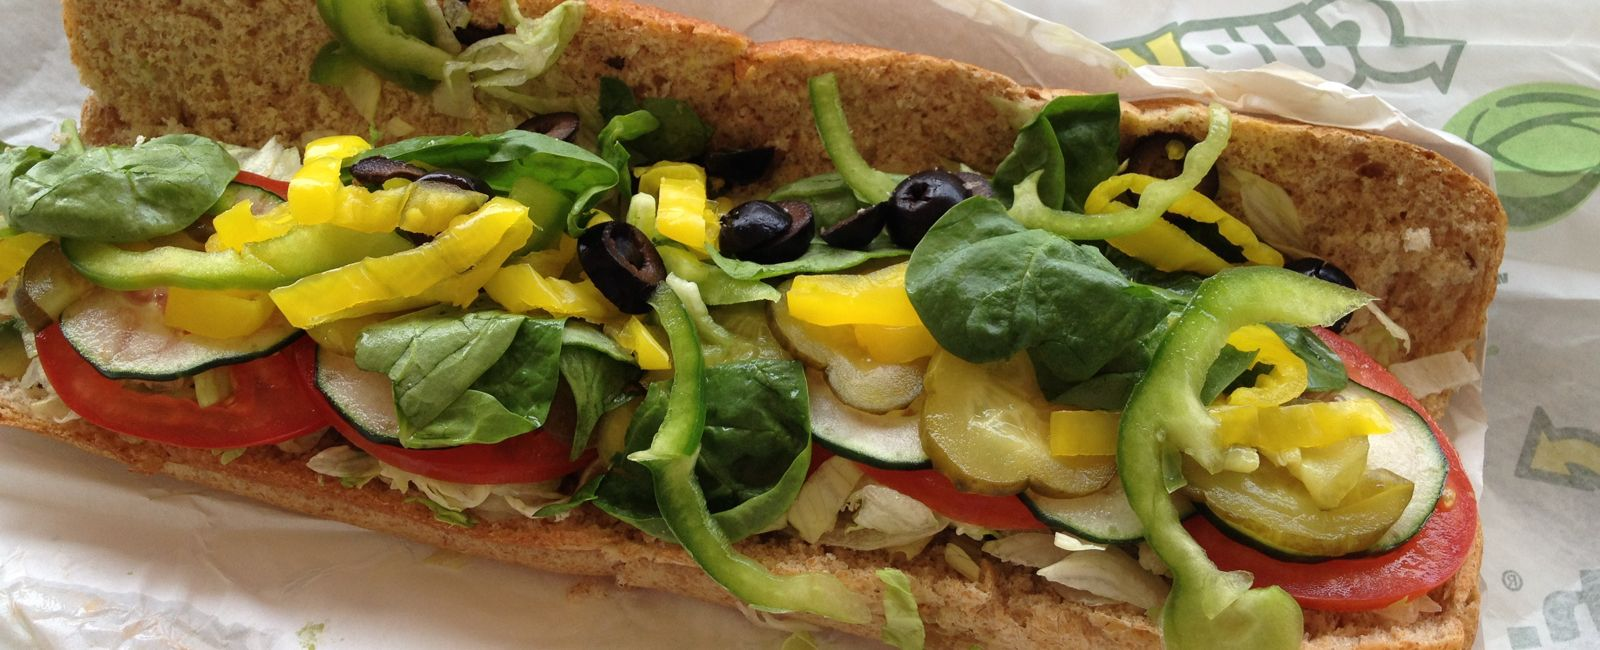 Tip 12 vegan fast food meals foodvegan pinterest vegan fast tip 12 vegan fast food meals forumfinder Image collections